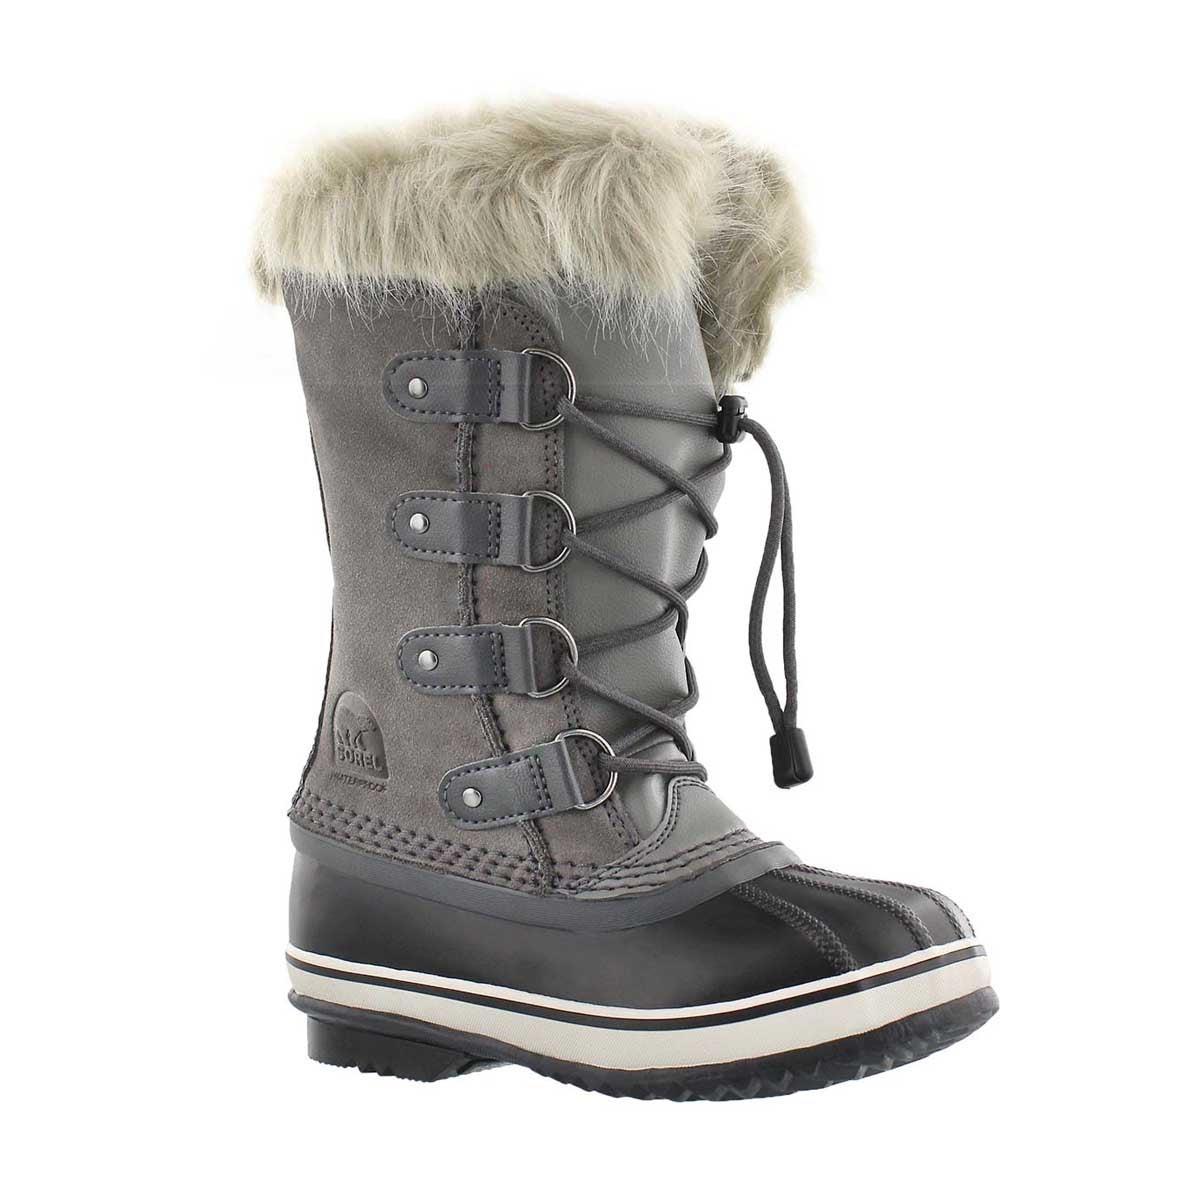 Girls' JOAN OF ARCTIC quarry winter boots